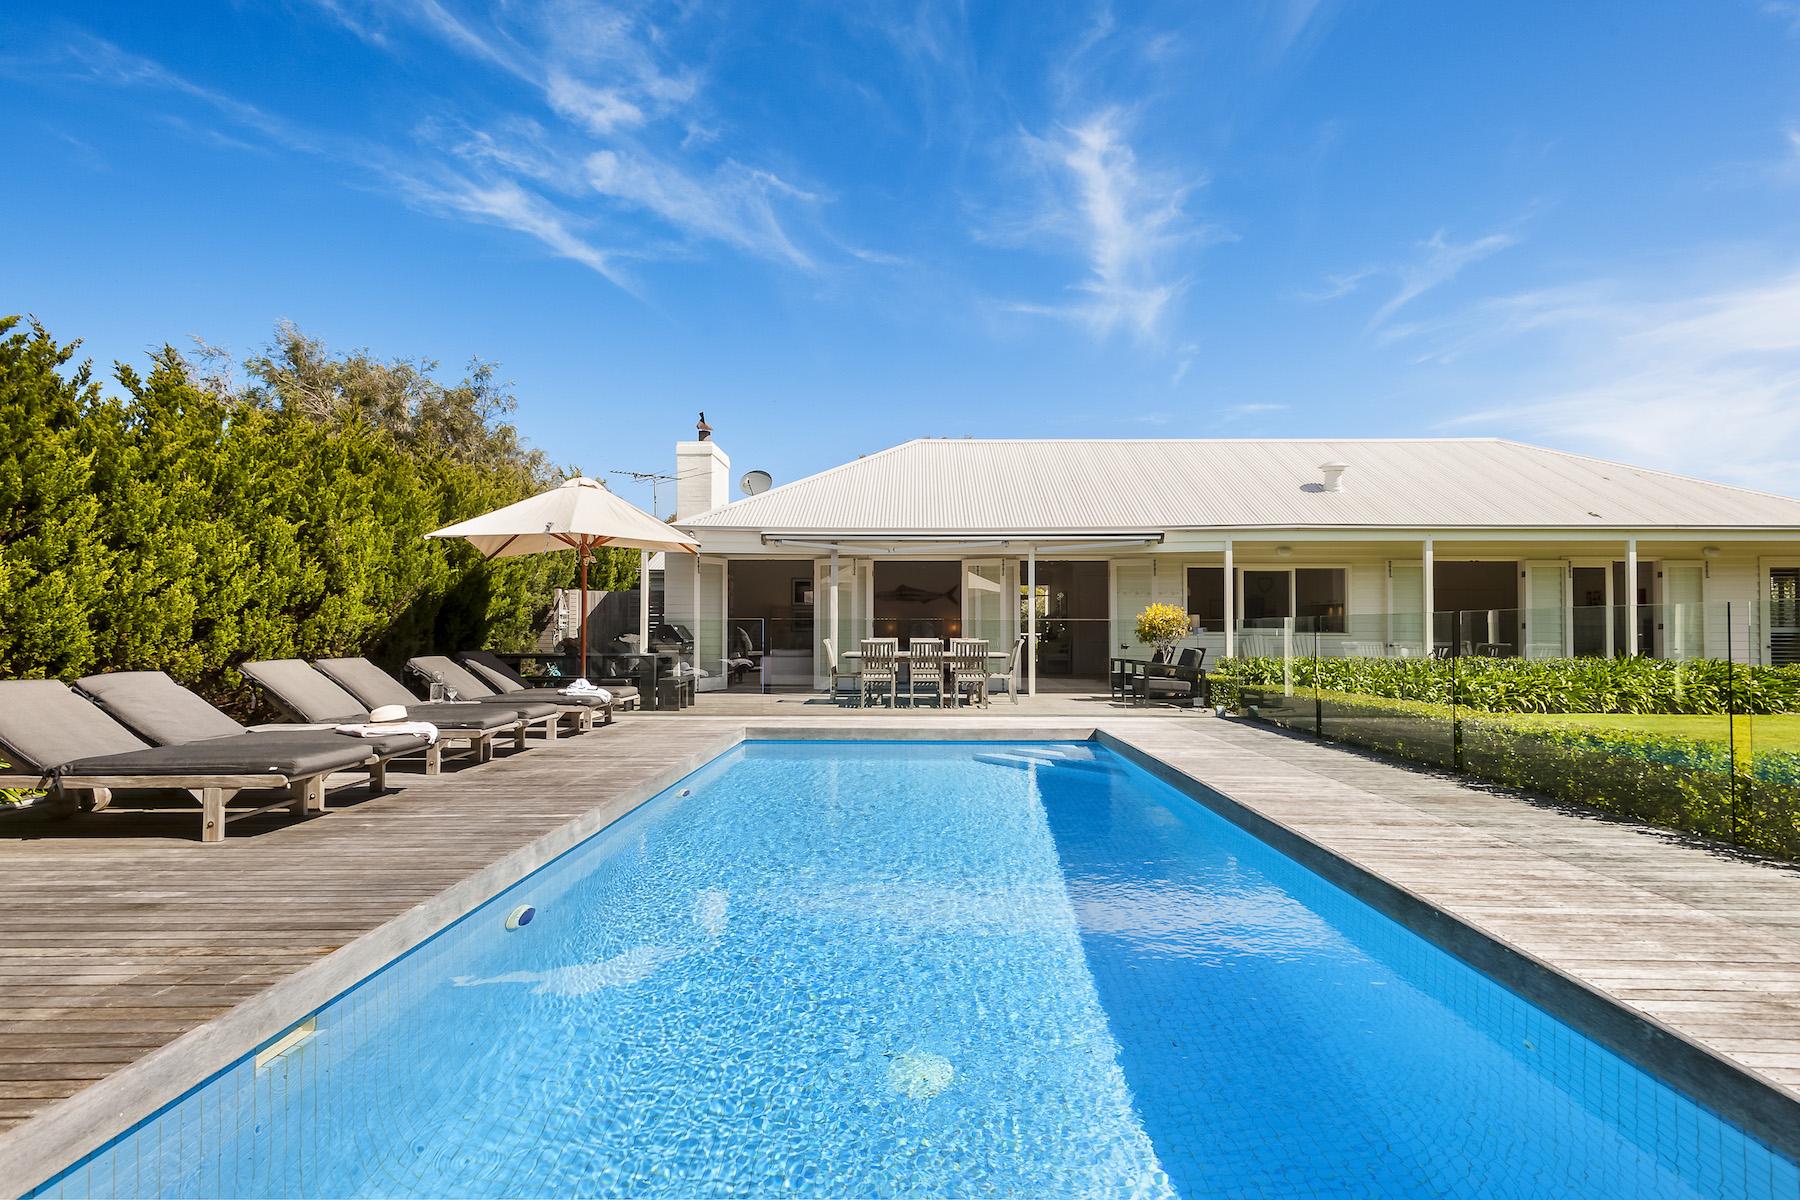 Moradia para Venda às 8 Kindra Close, Portsea Portsea, Victoria, 3944 Austrália